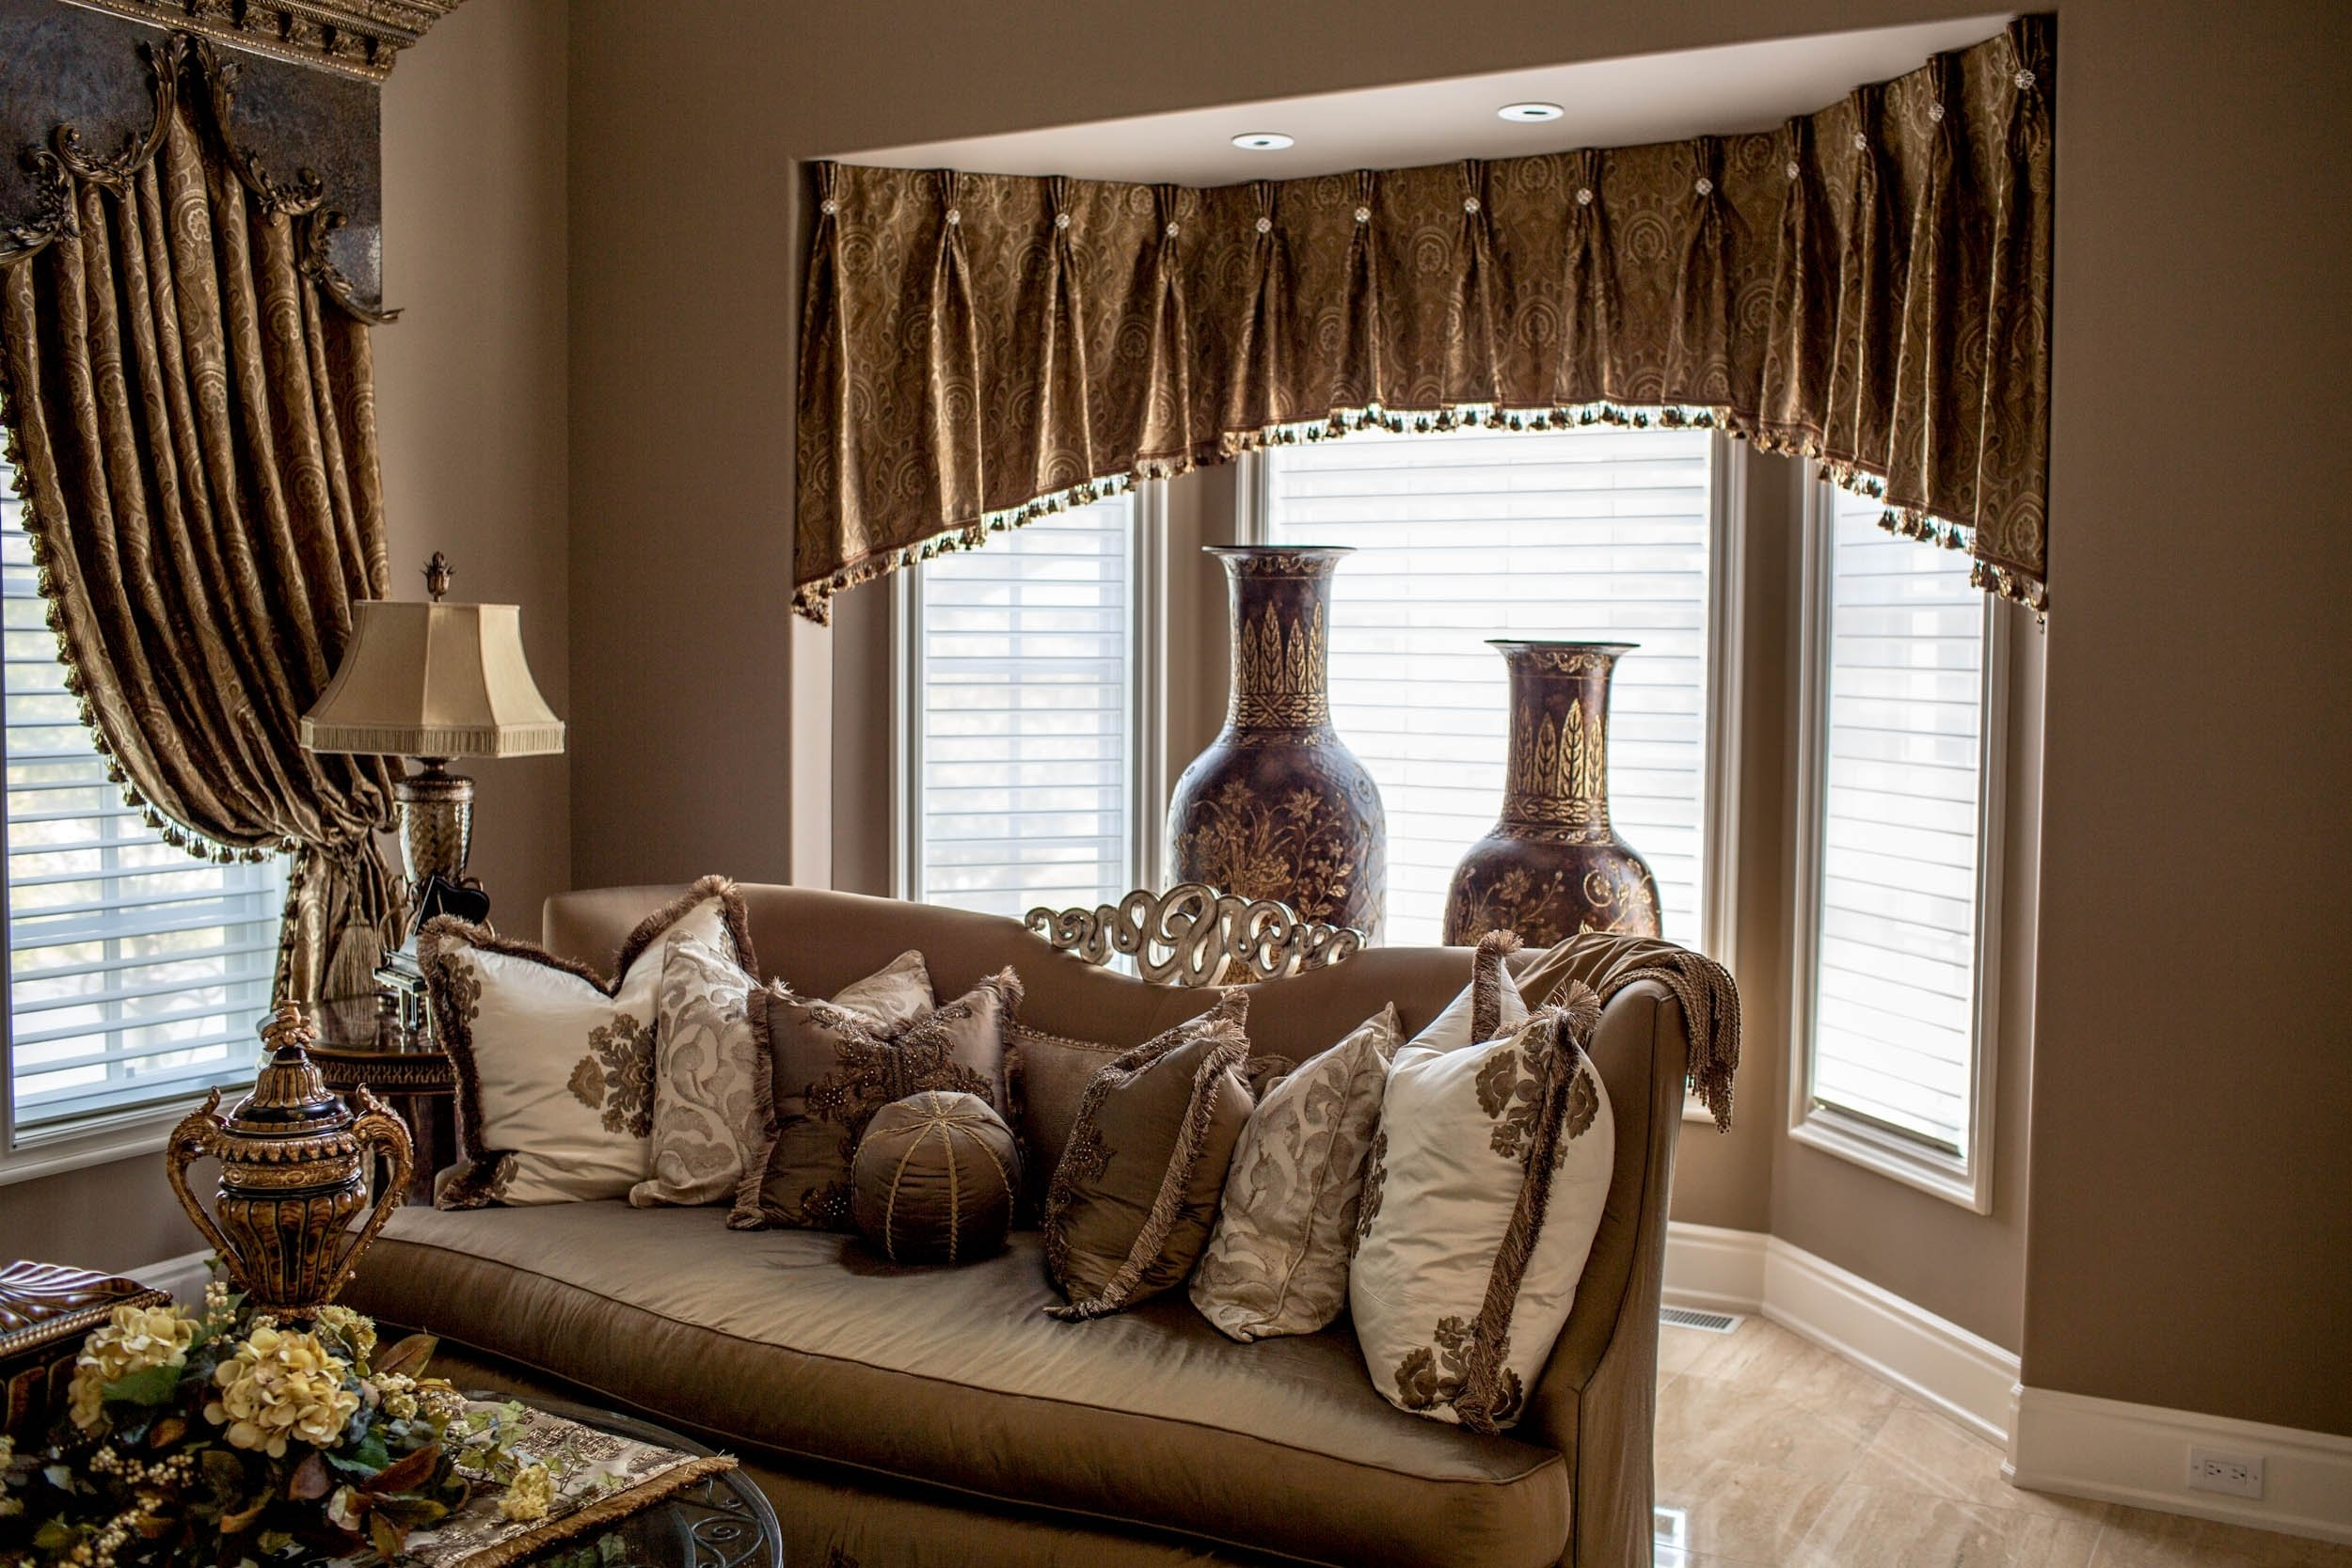 10 Cute Windows Treatment Ideas For Living Room window treatment ideas for living room interior design vintage 1